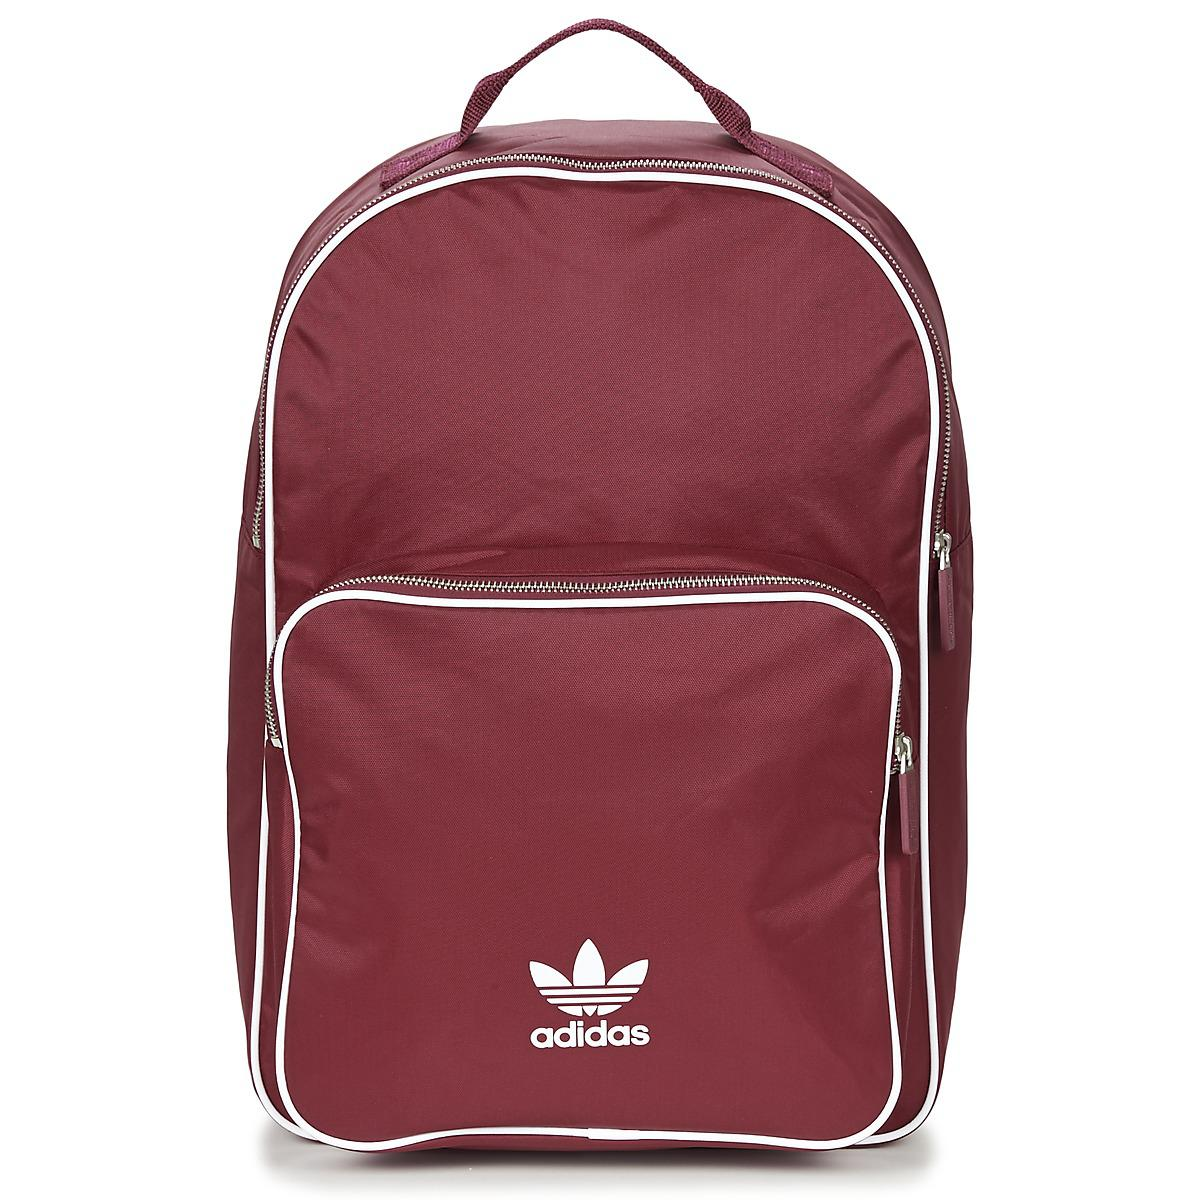 30548eefb7d Adidas - Red Classic Adicolor Bp Backpack for Men - Lyst. View fullscreen